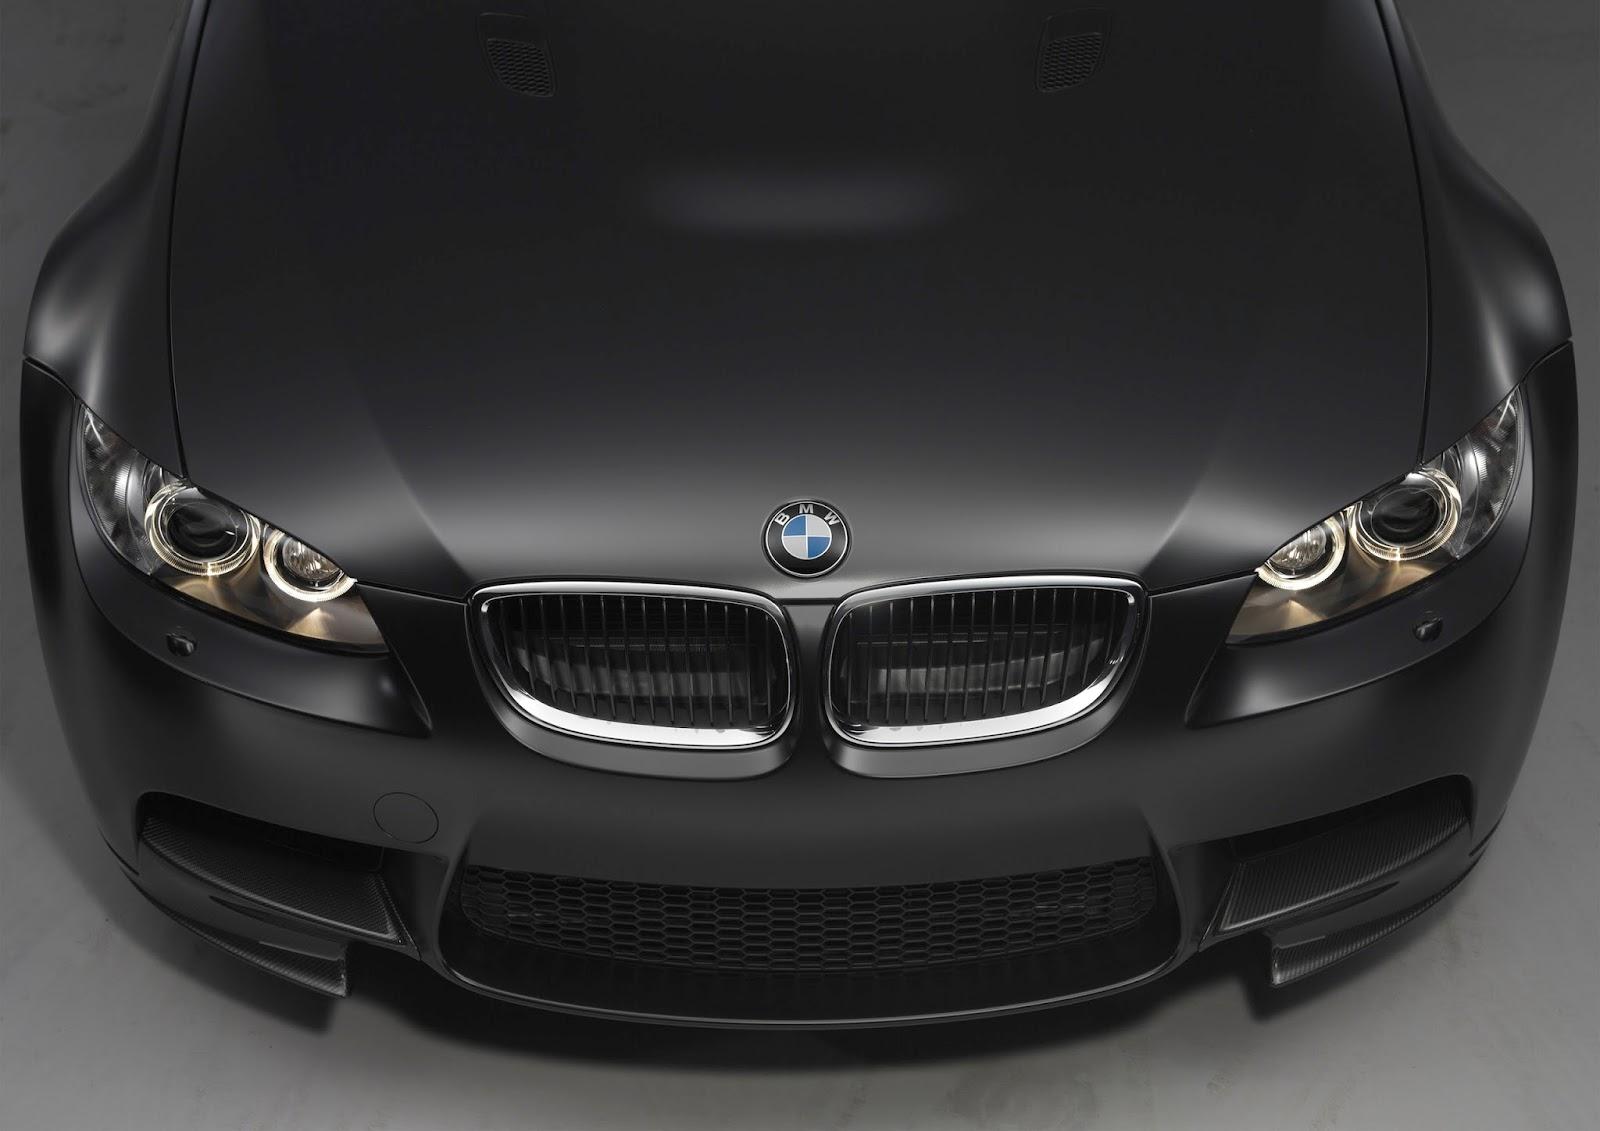 BMWの壁紙 M3 BMWロゴ